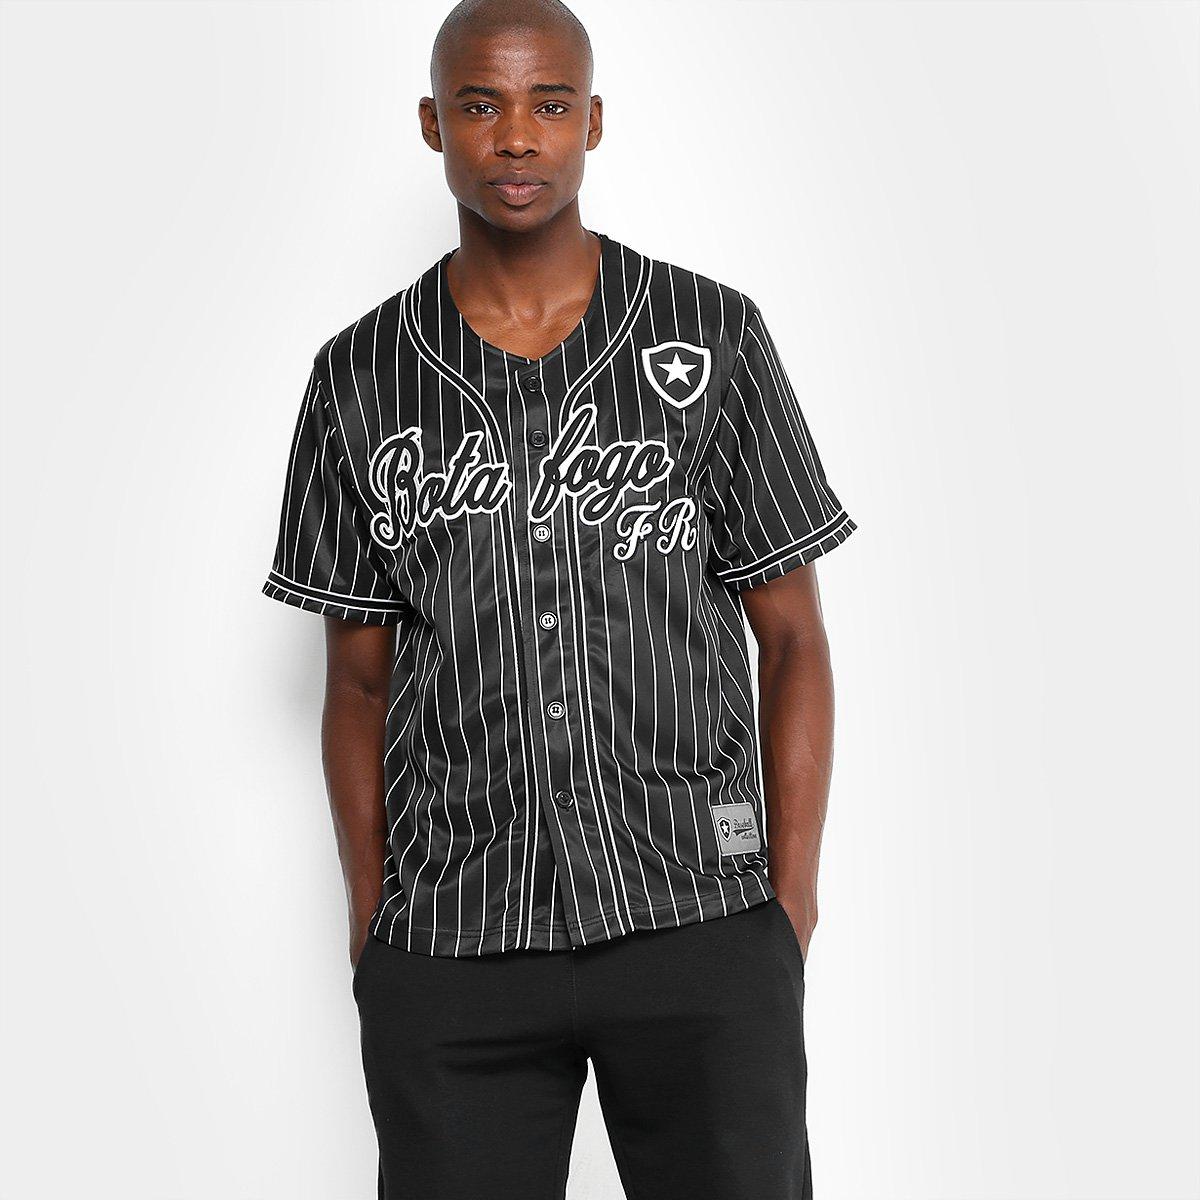 173ada9c6 Camisa Botafogo Baseball Masculina